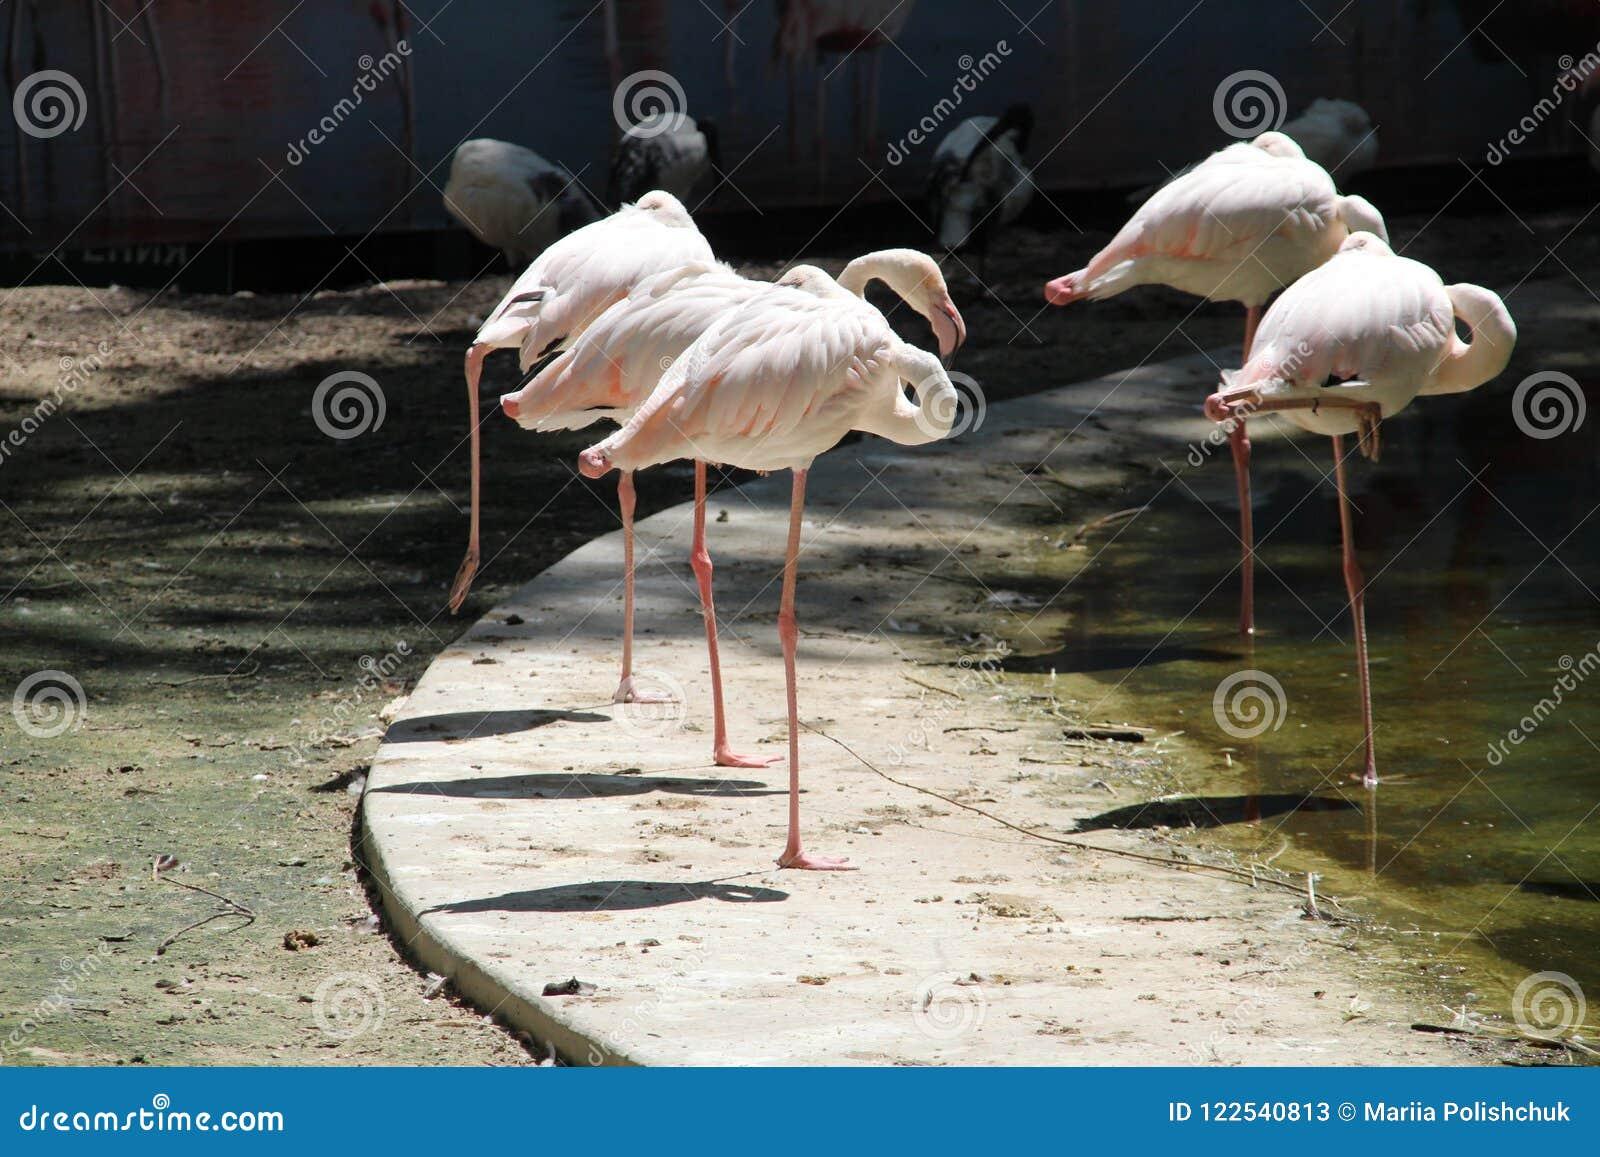 Pink Flamingo Child of the Sunset